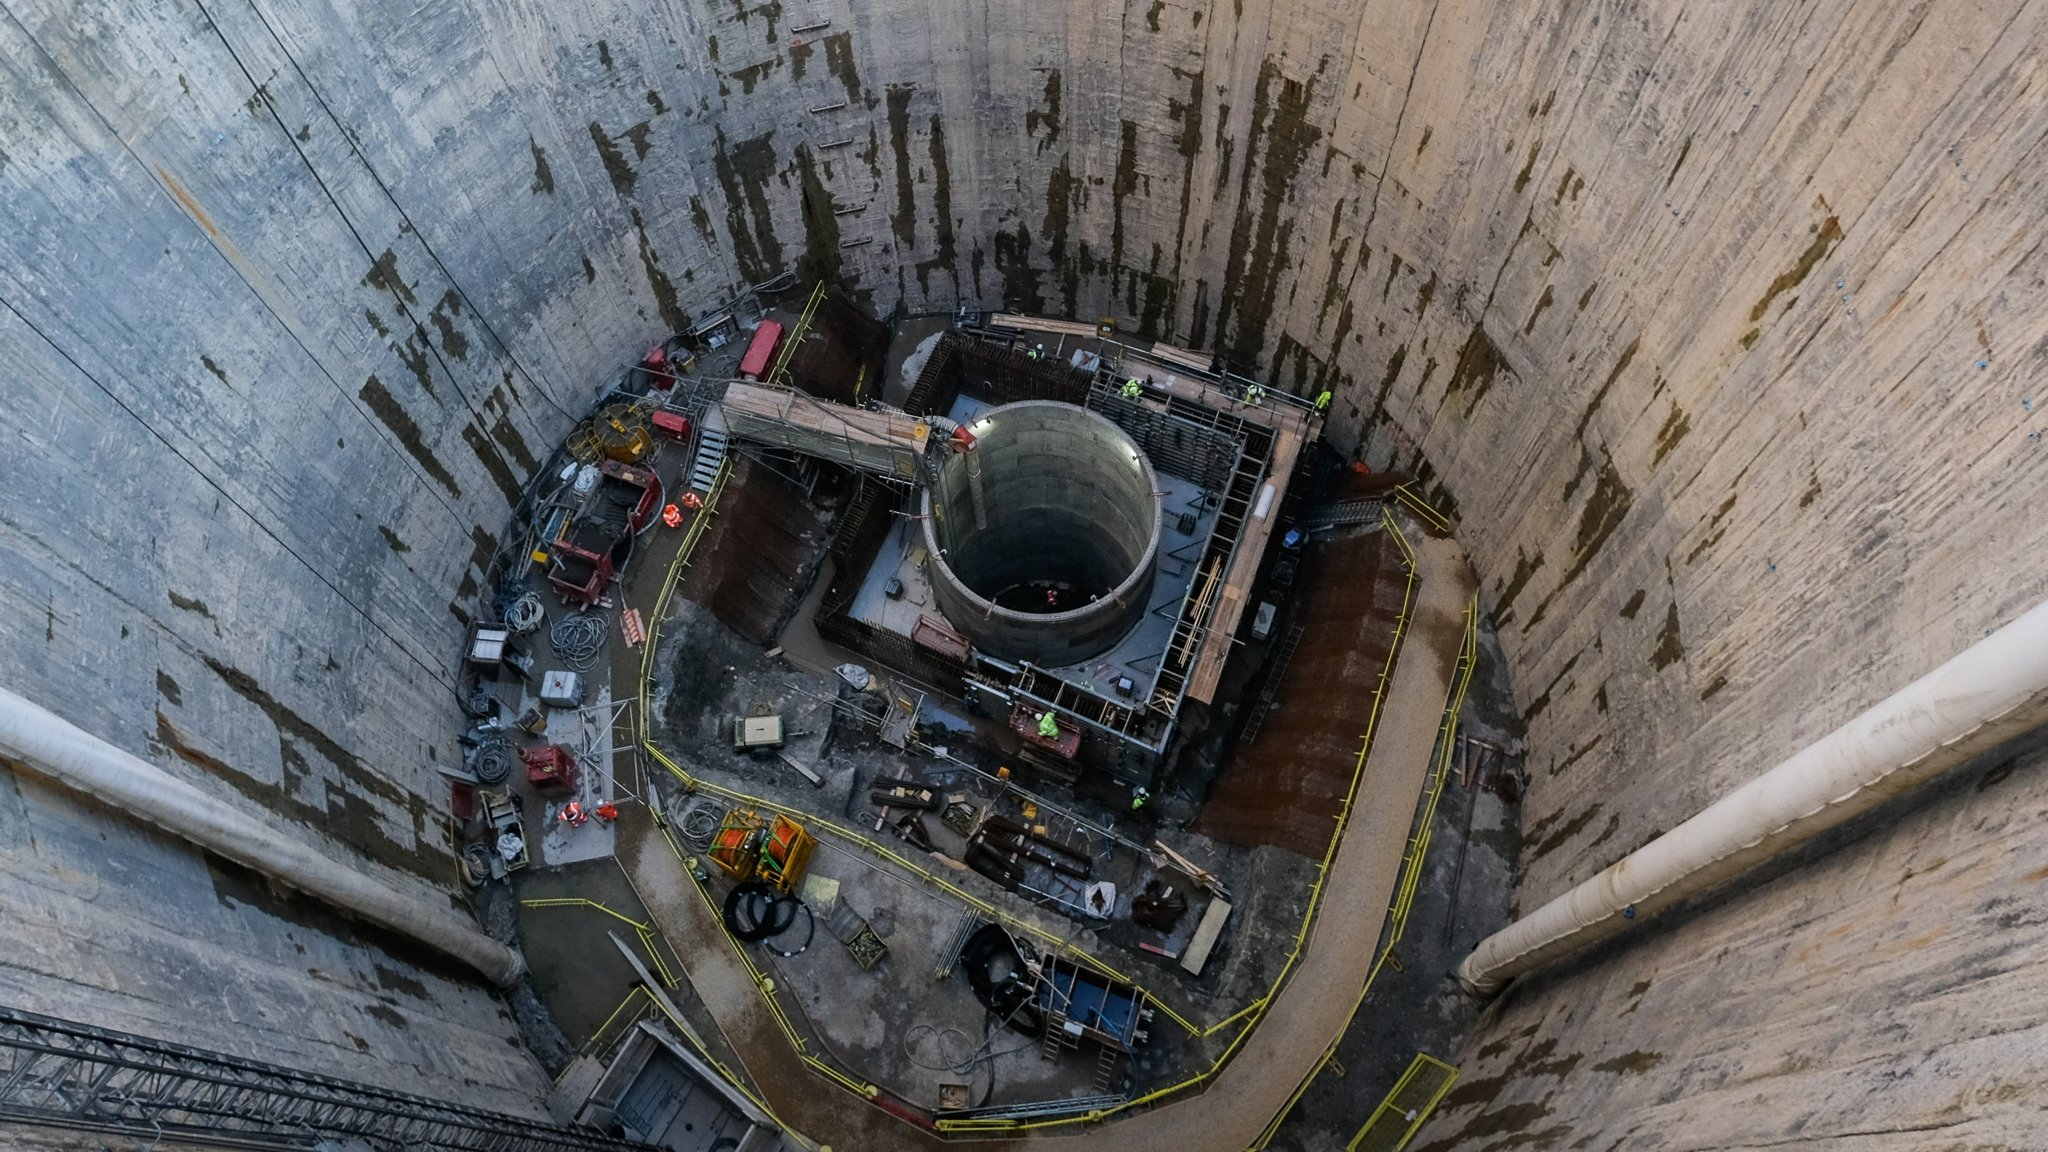 Sirius Minerals digs deep to make $5bn fertiliser mine a